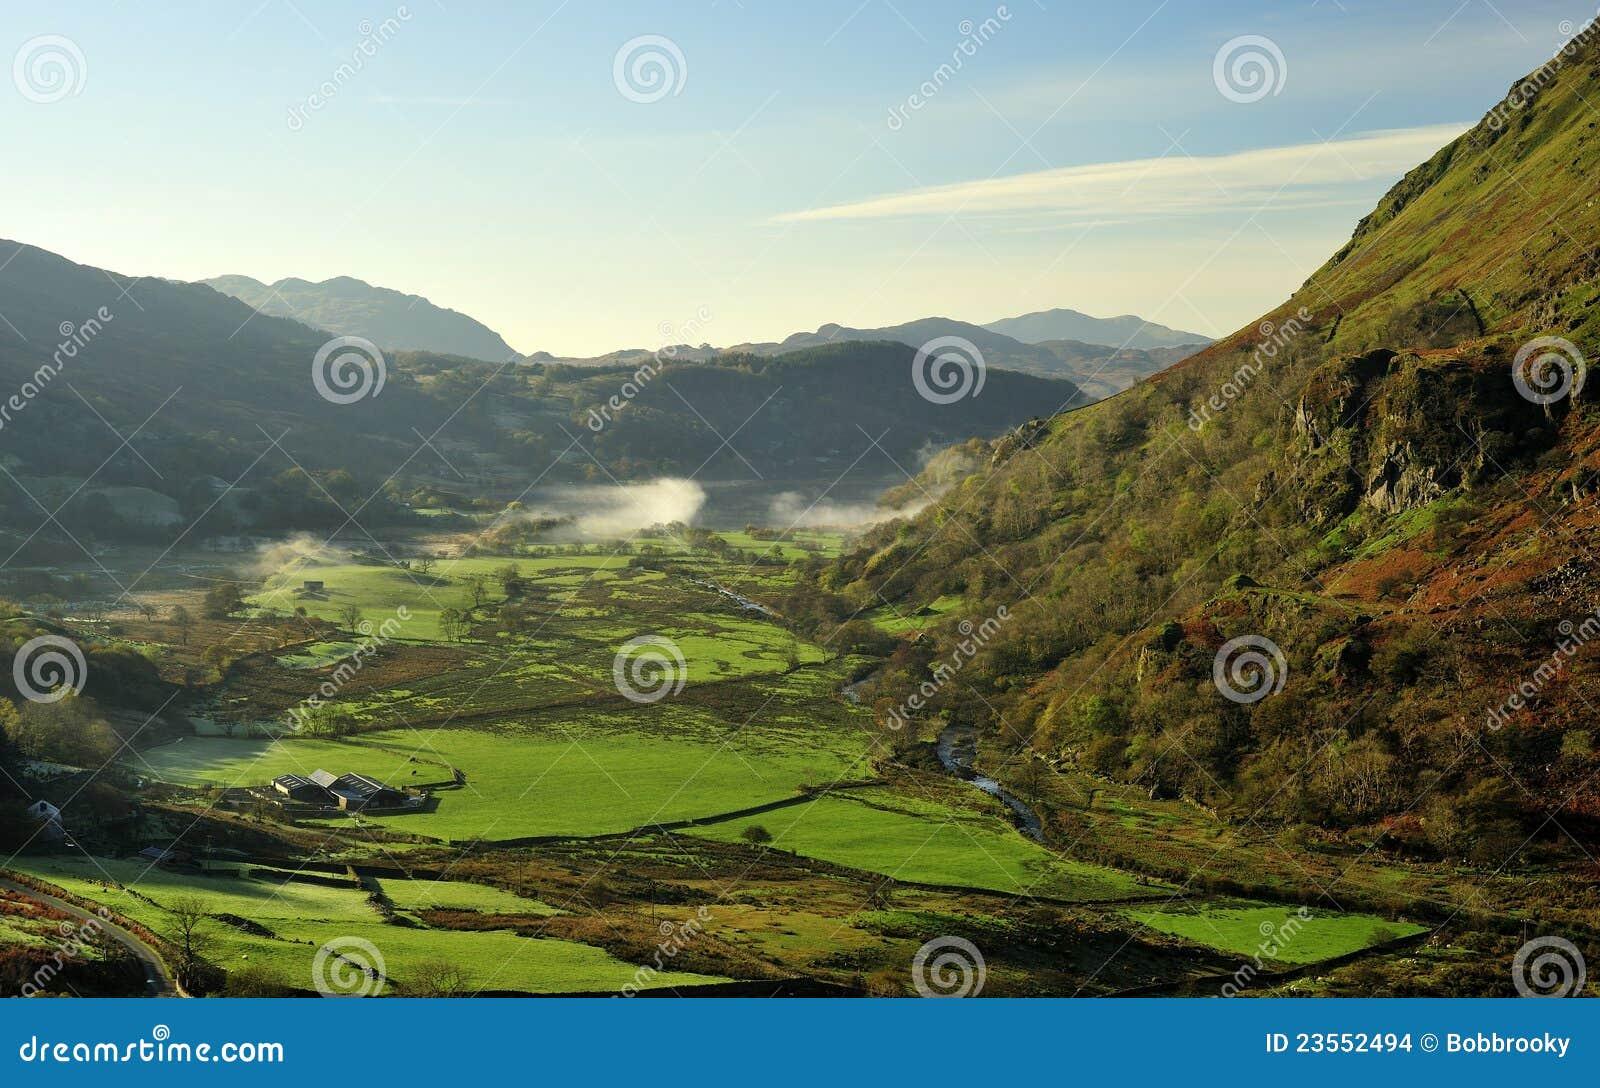 Valle di Nant Gynant, Snowdonia, Galles del nord